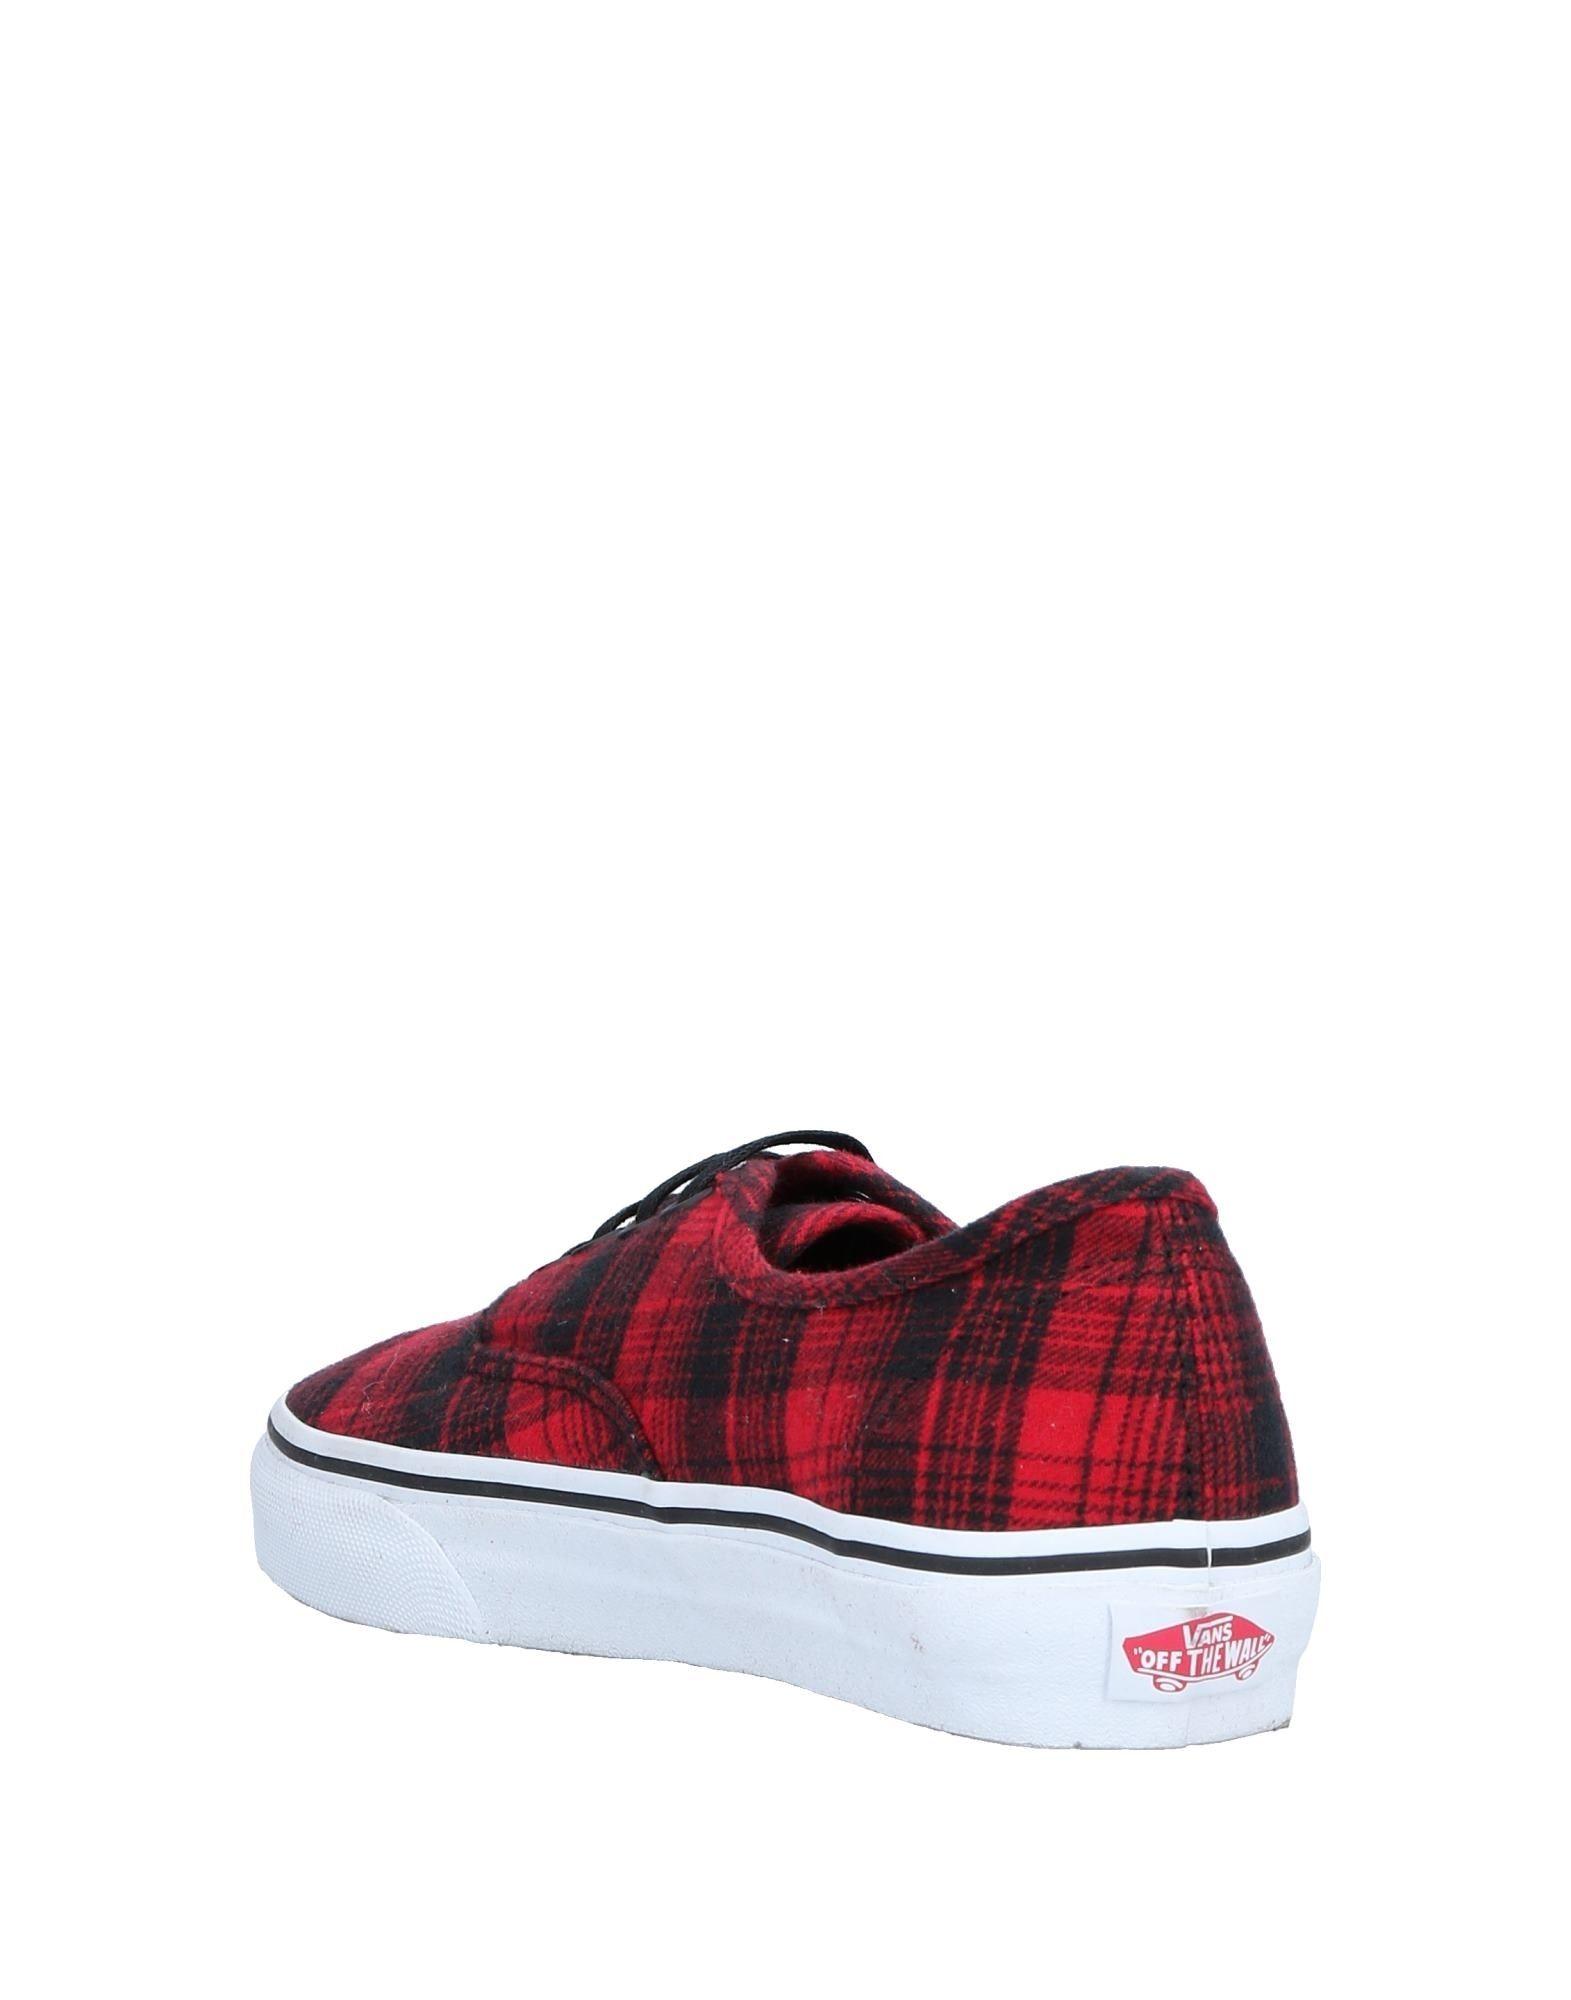 Vans Sneakers Qualität Damen  11519969RE Gute Qualität Sneakers beliebte Schuhe fca0c2